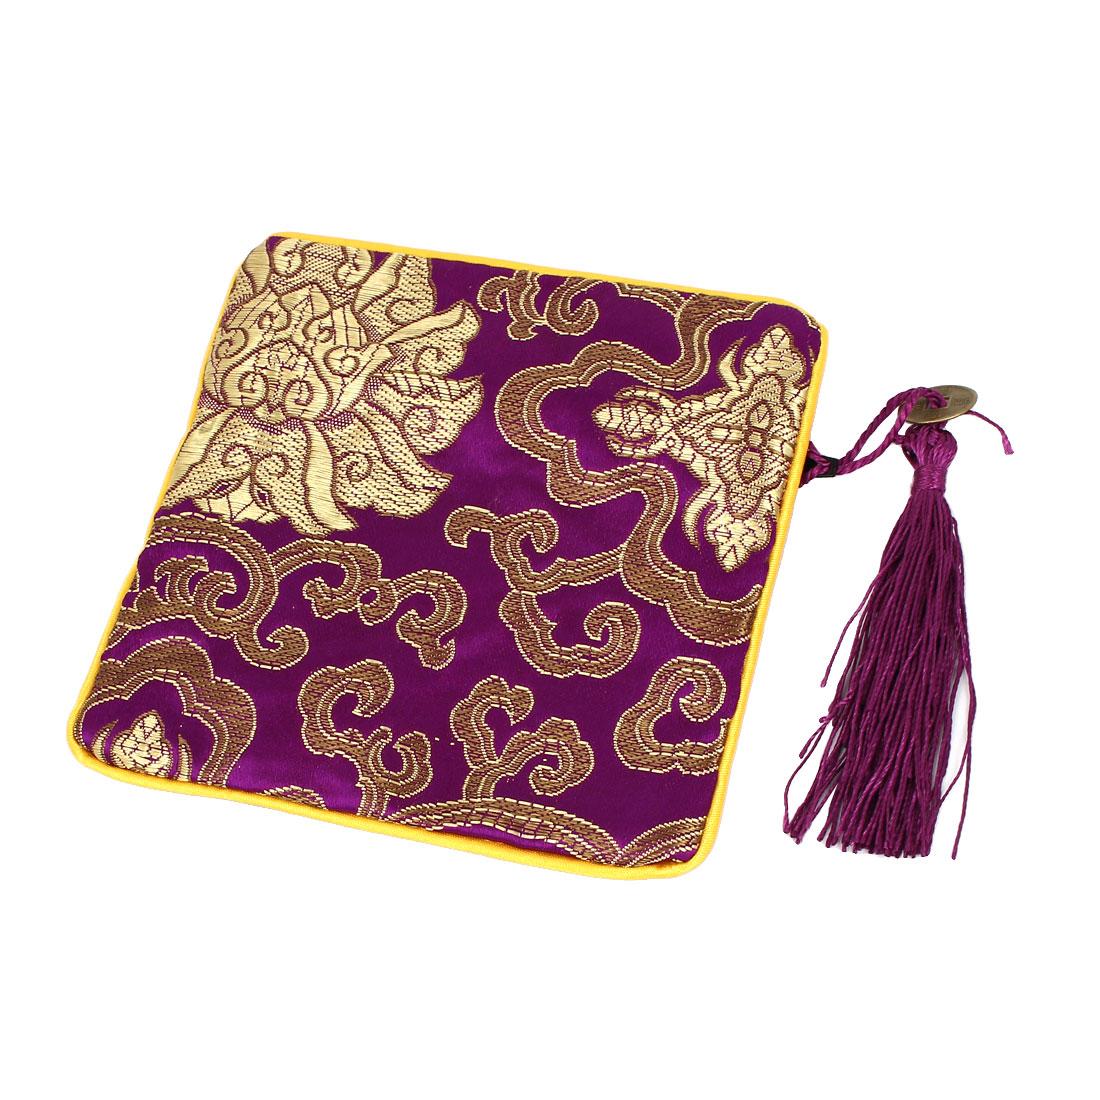 Tassel Pendant Zipper Closure Cosmetic Jewelry Gift Coin Bag Purse Pouch Purple